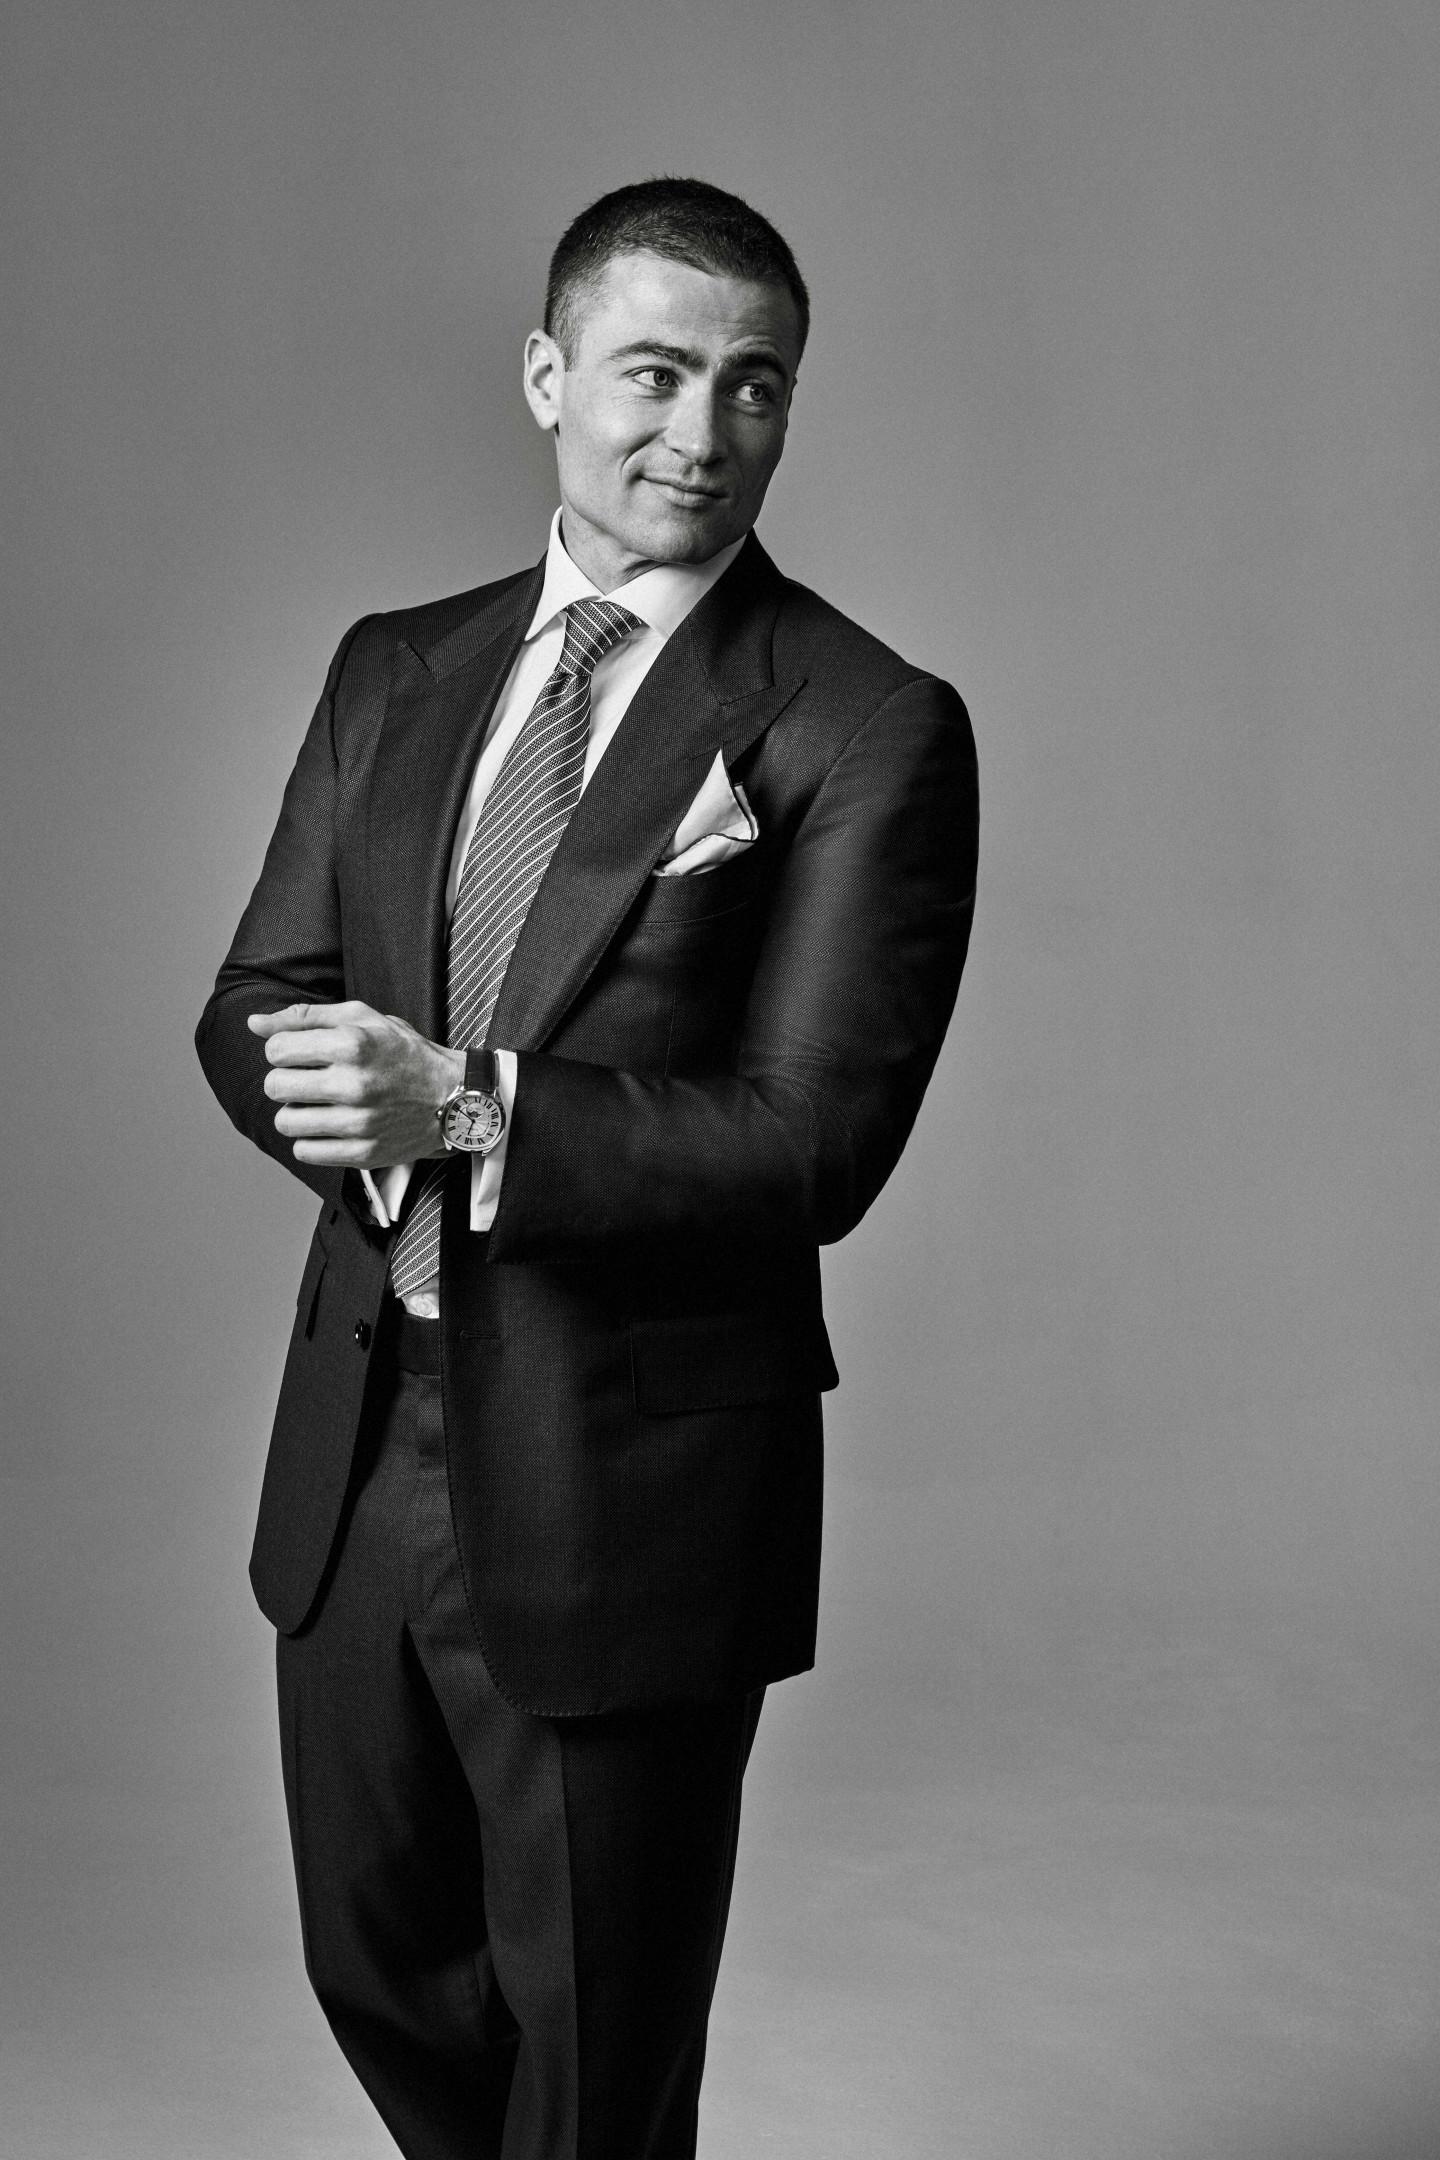 На Борисе: костюм, сорочка, галстук, платок - все Tom Ford, запонки Cartier, часы Drive de Cartier